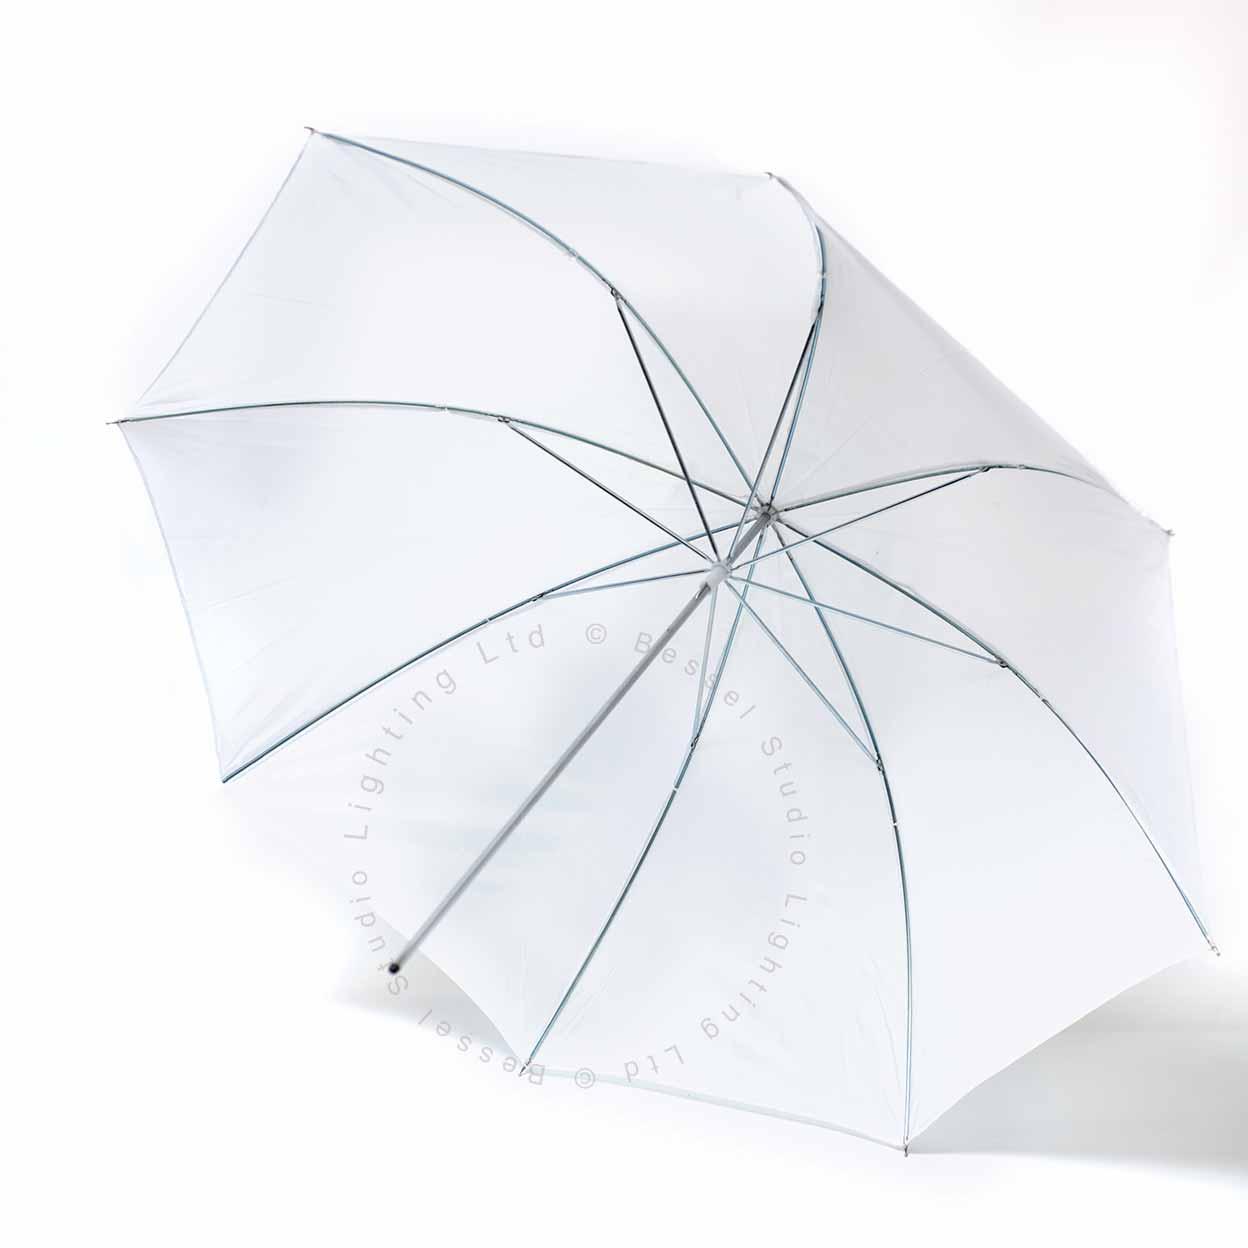 33imch White Shoot Through Umbrella 7mm stem fits Elinchrom lamps Bessel 84cm